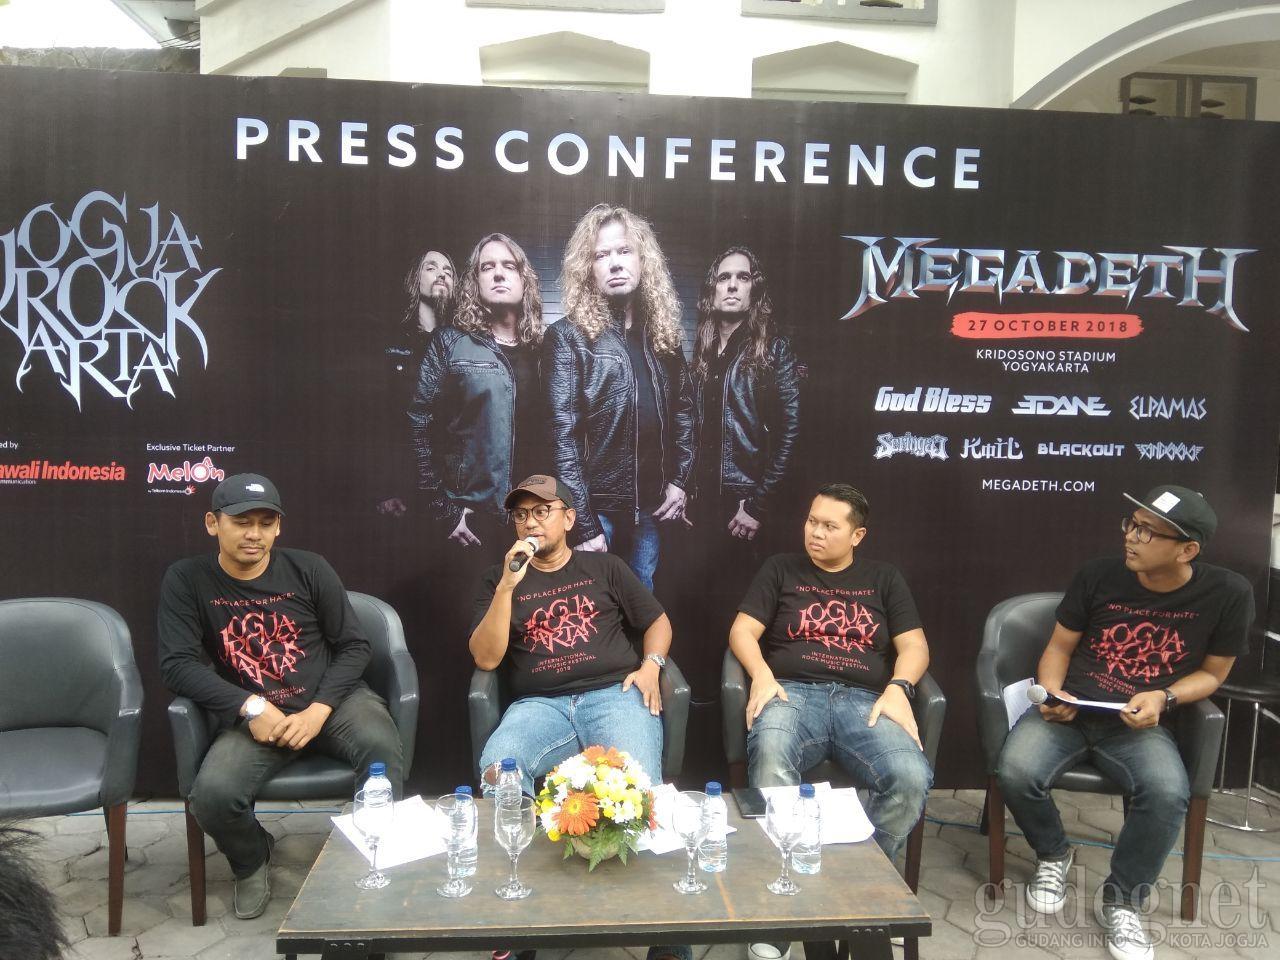 Megadeth Siap Beraksi di Panggung Jogjarockarta